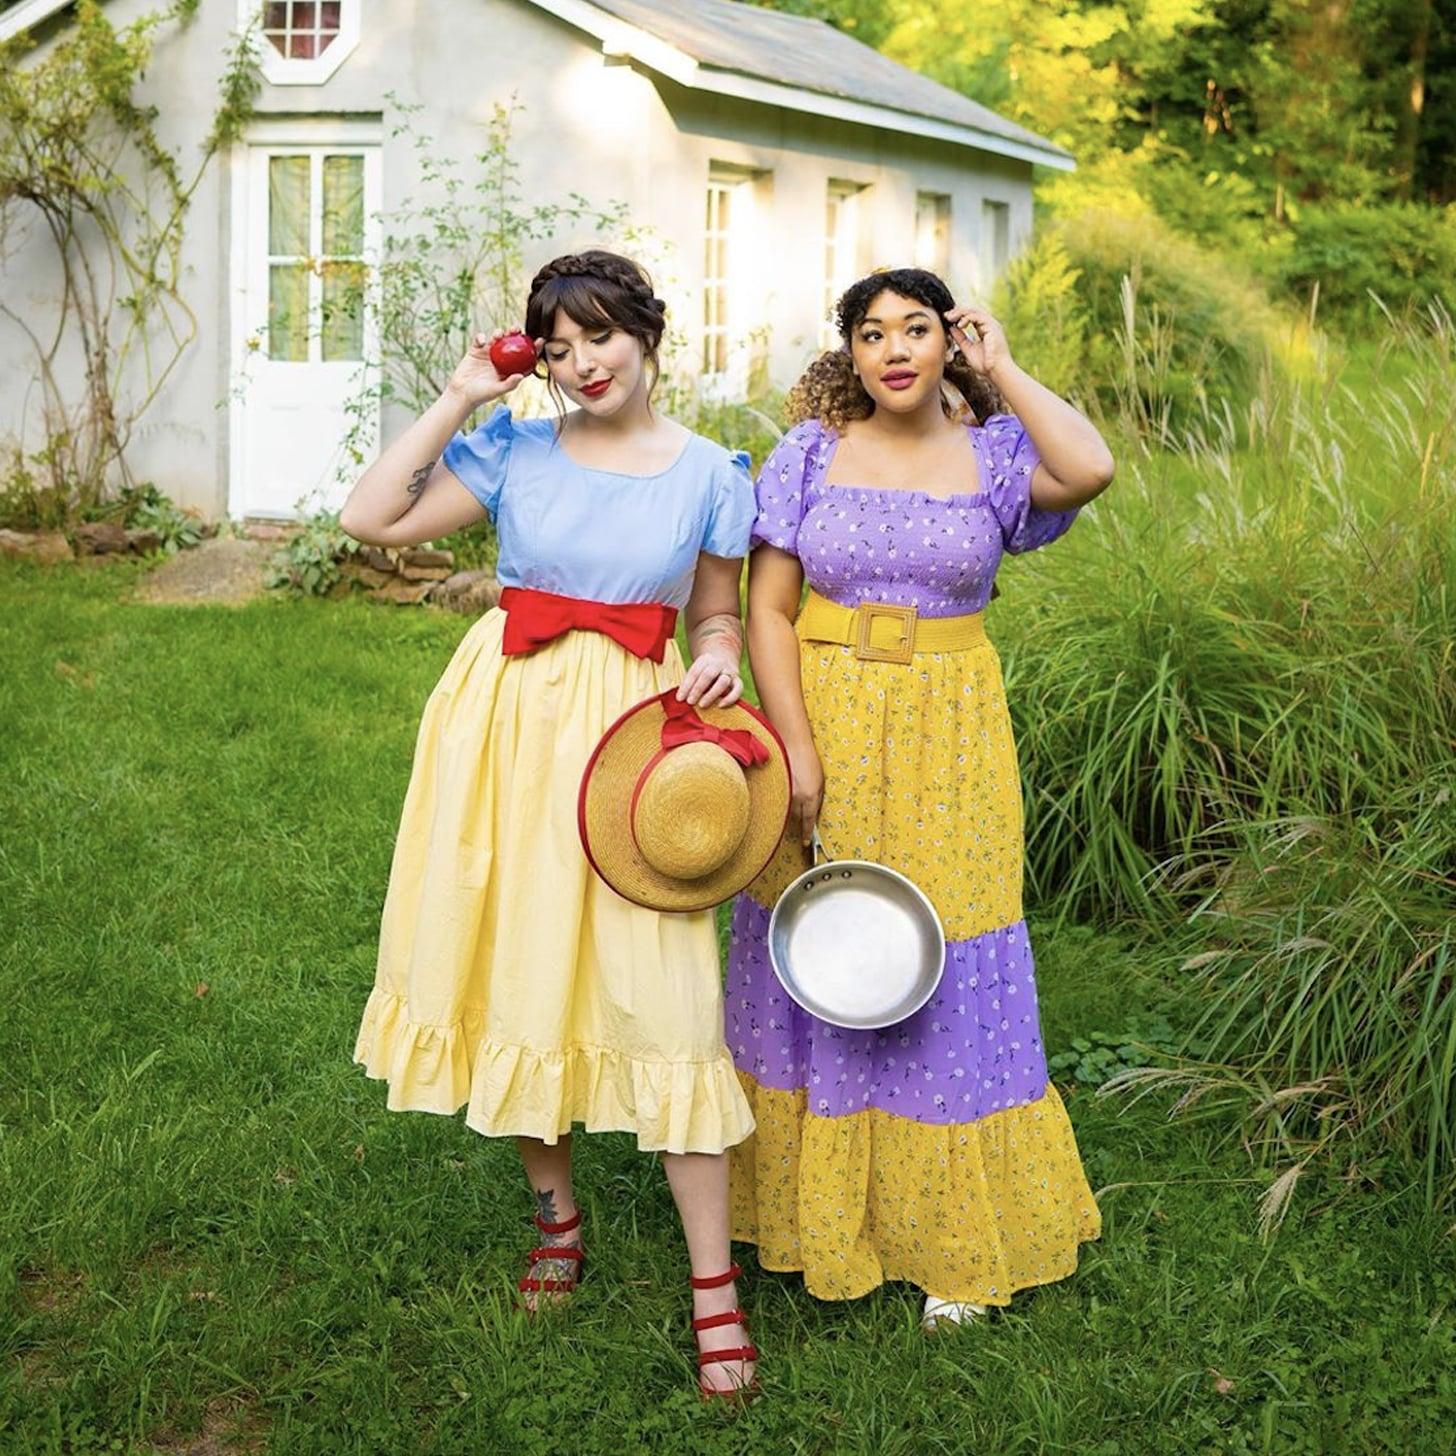 Halloween Costumes For Two Women.Best Halloween Costumes For Best Friends 2020 Popsugar Love Sex